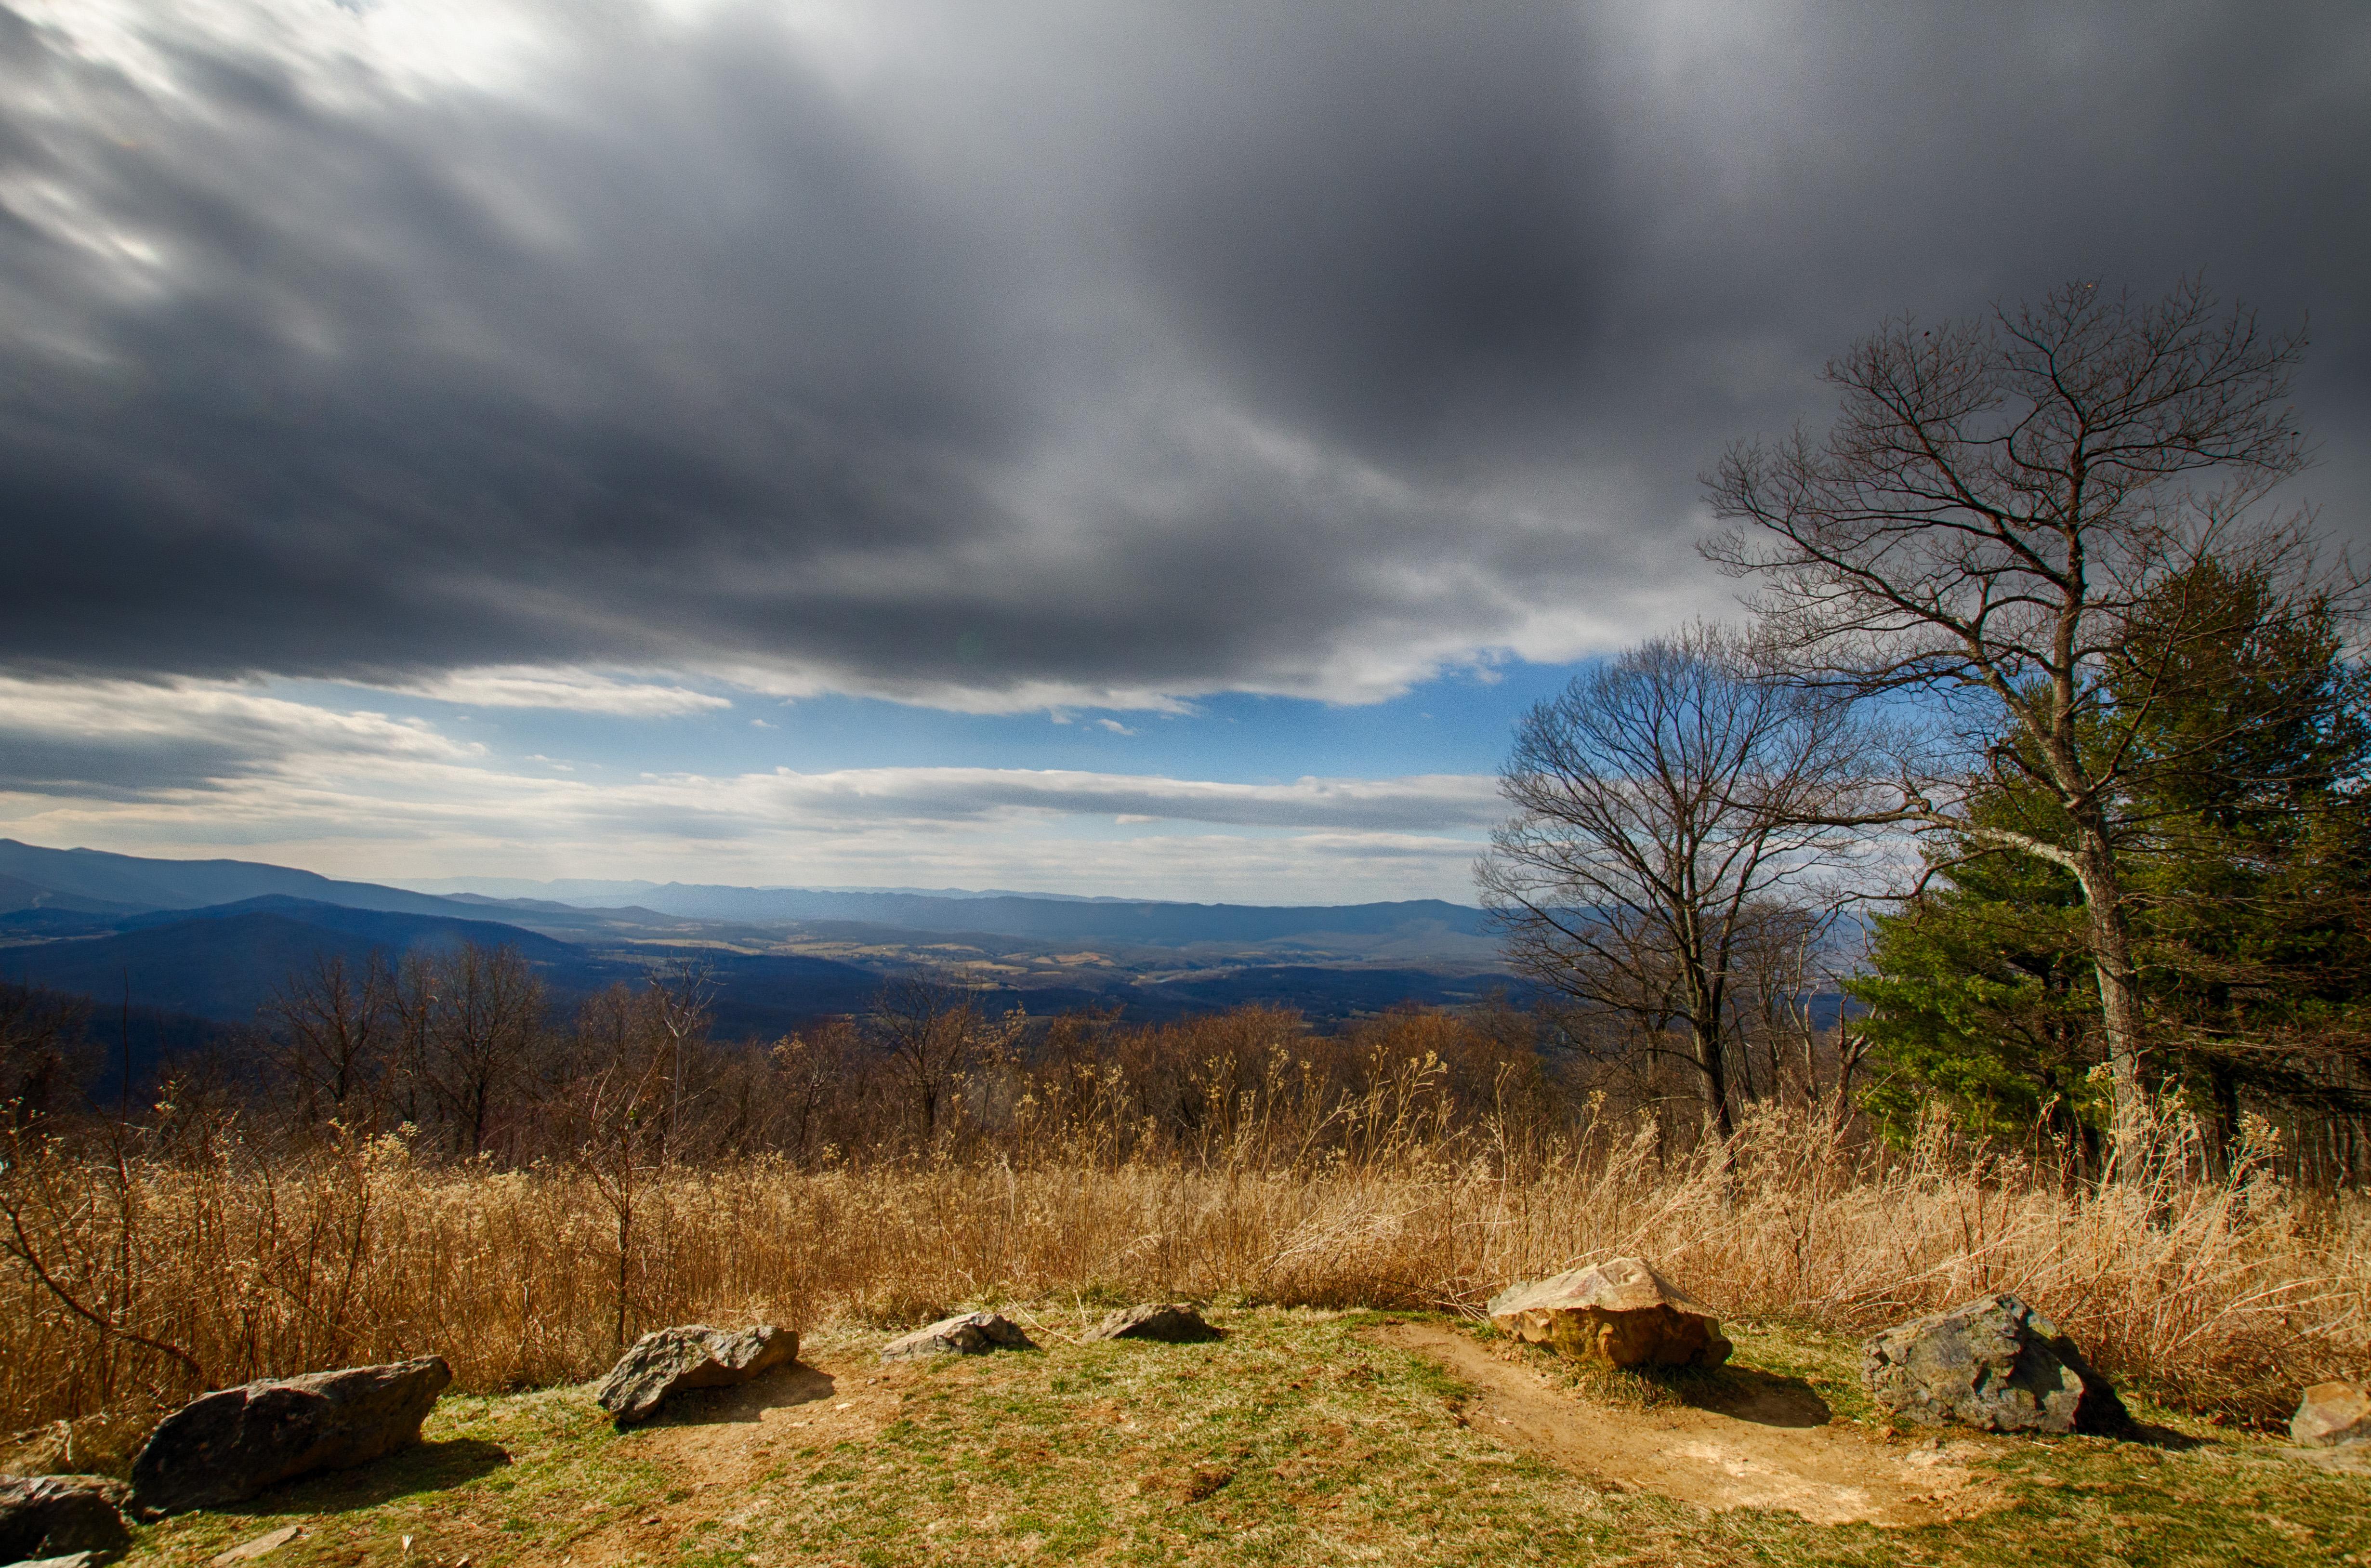 Front Royal Virginia Elevation : Elevation of edgewood st front royal va usa